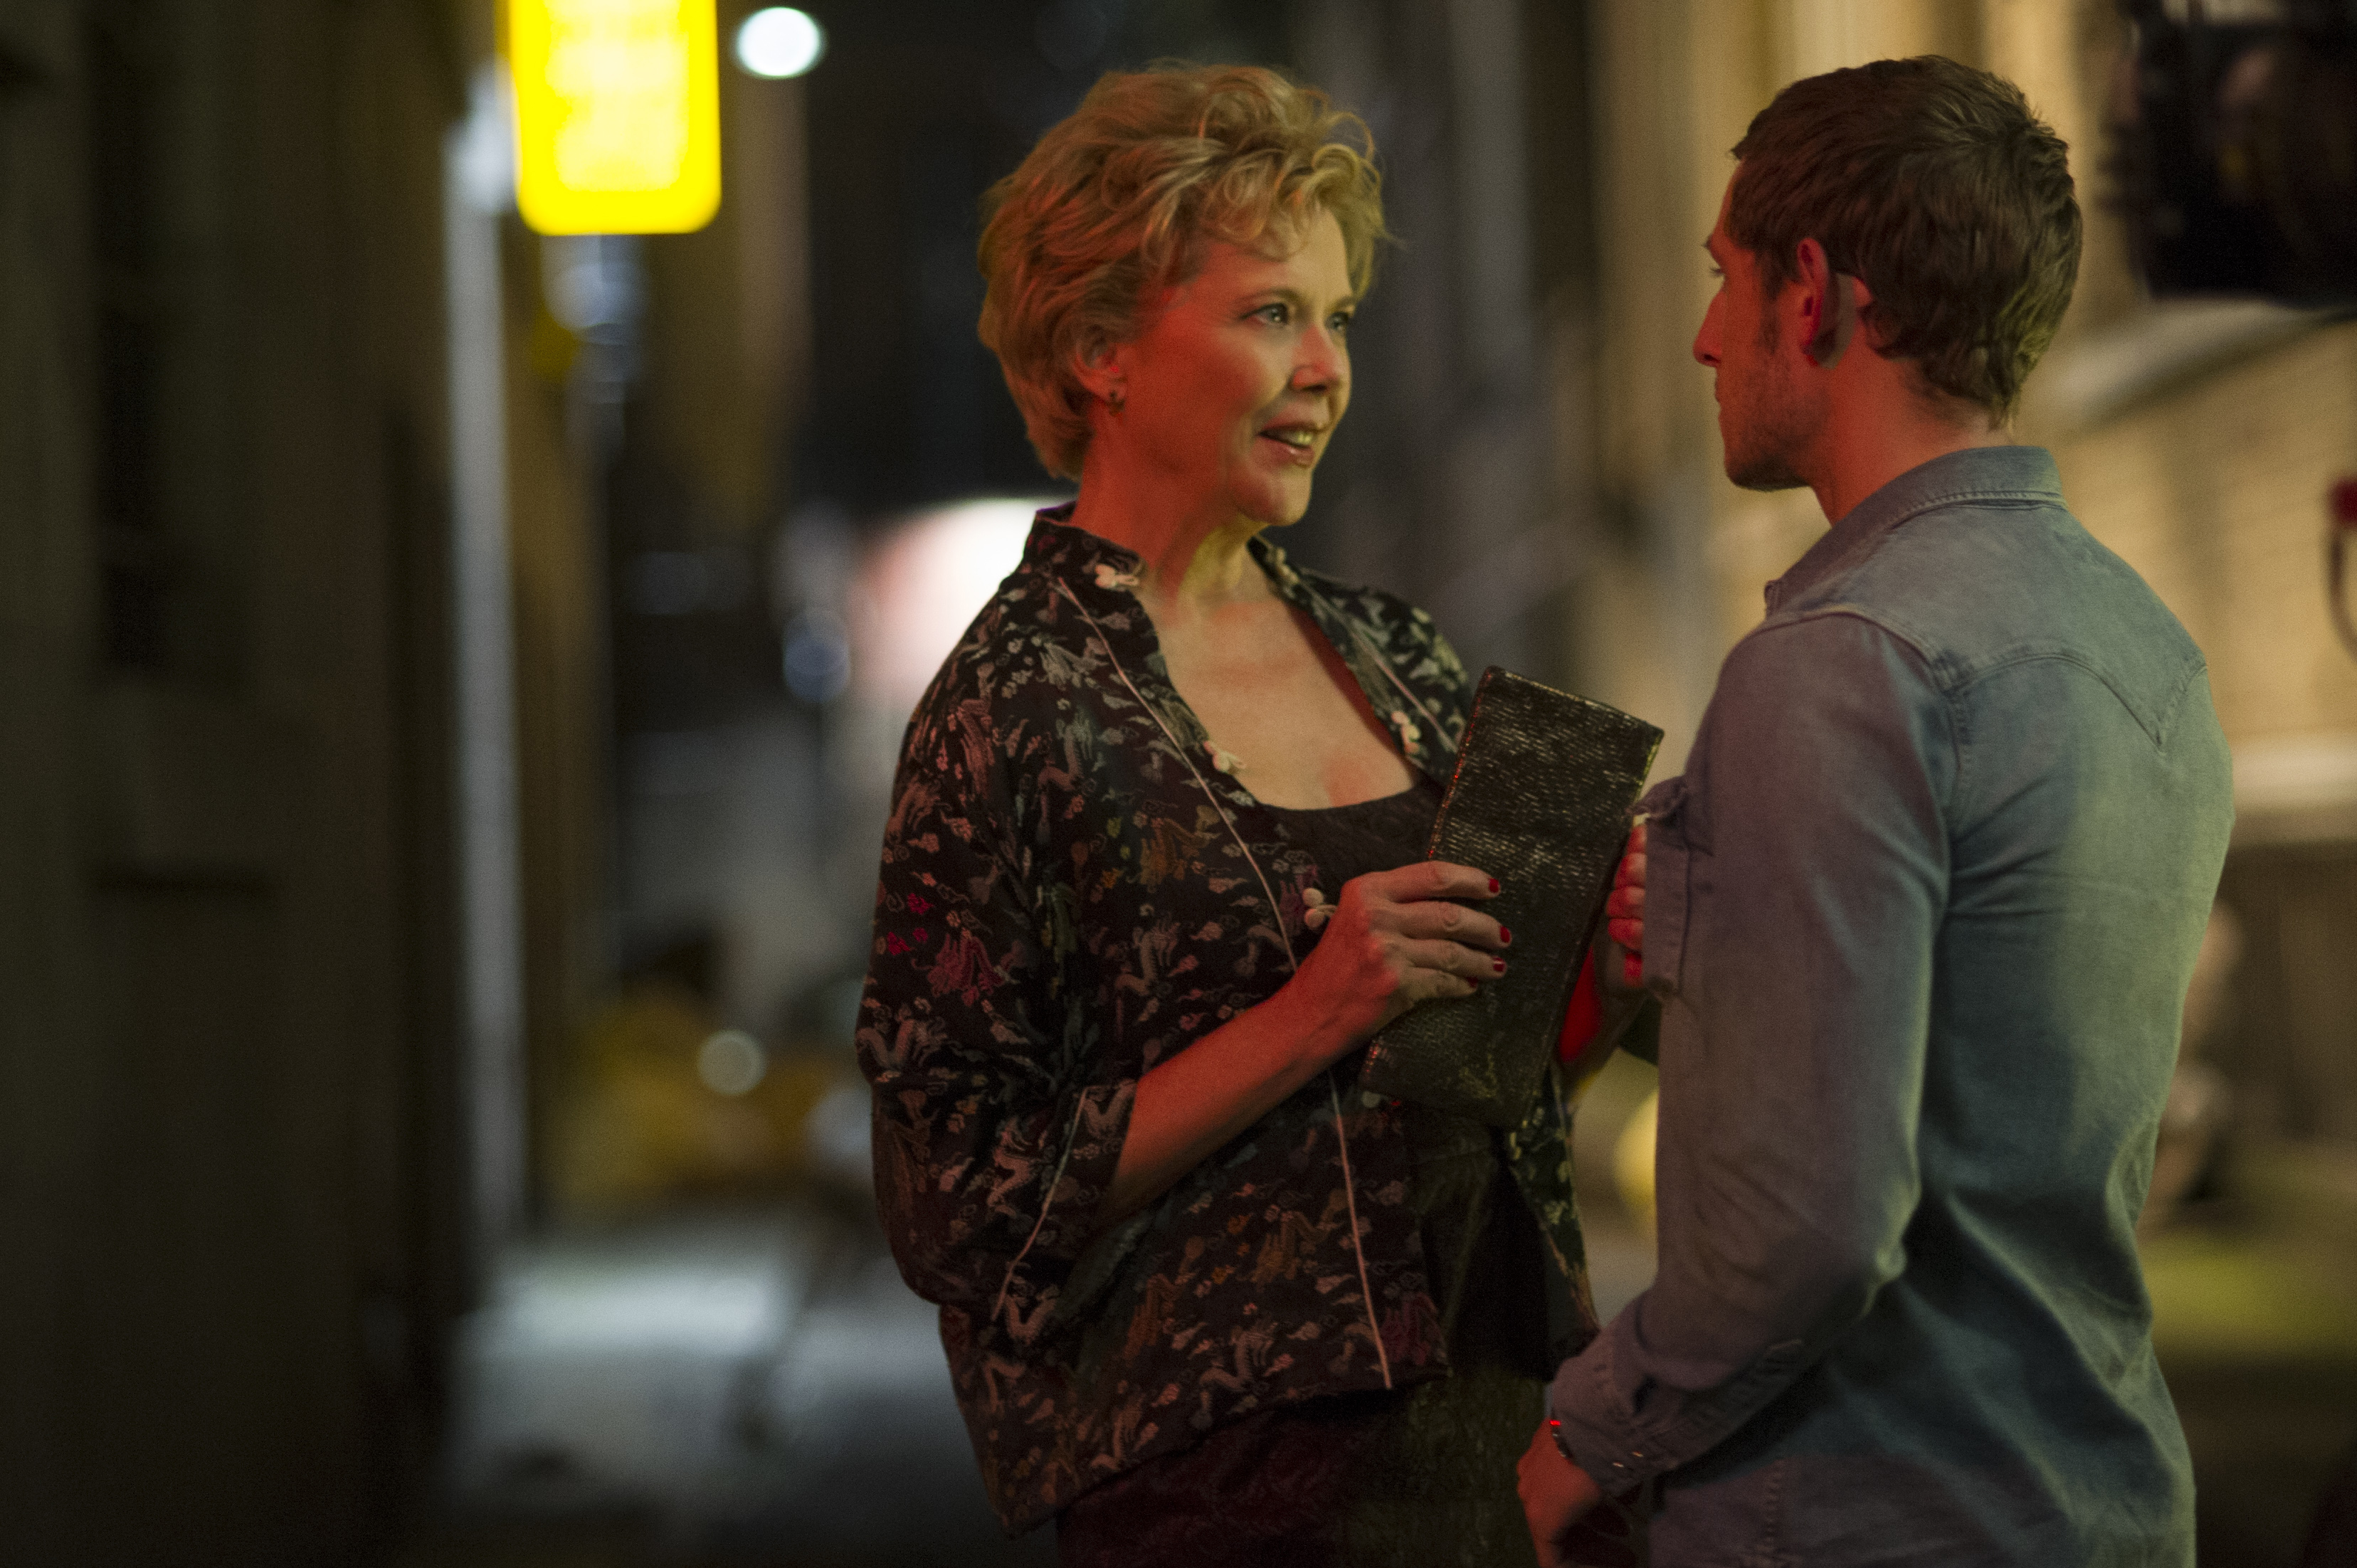 Film Stars Don't Die in Liverpool (10)